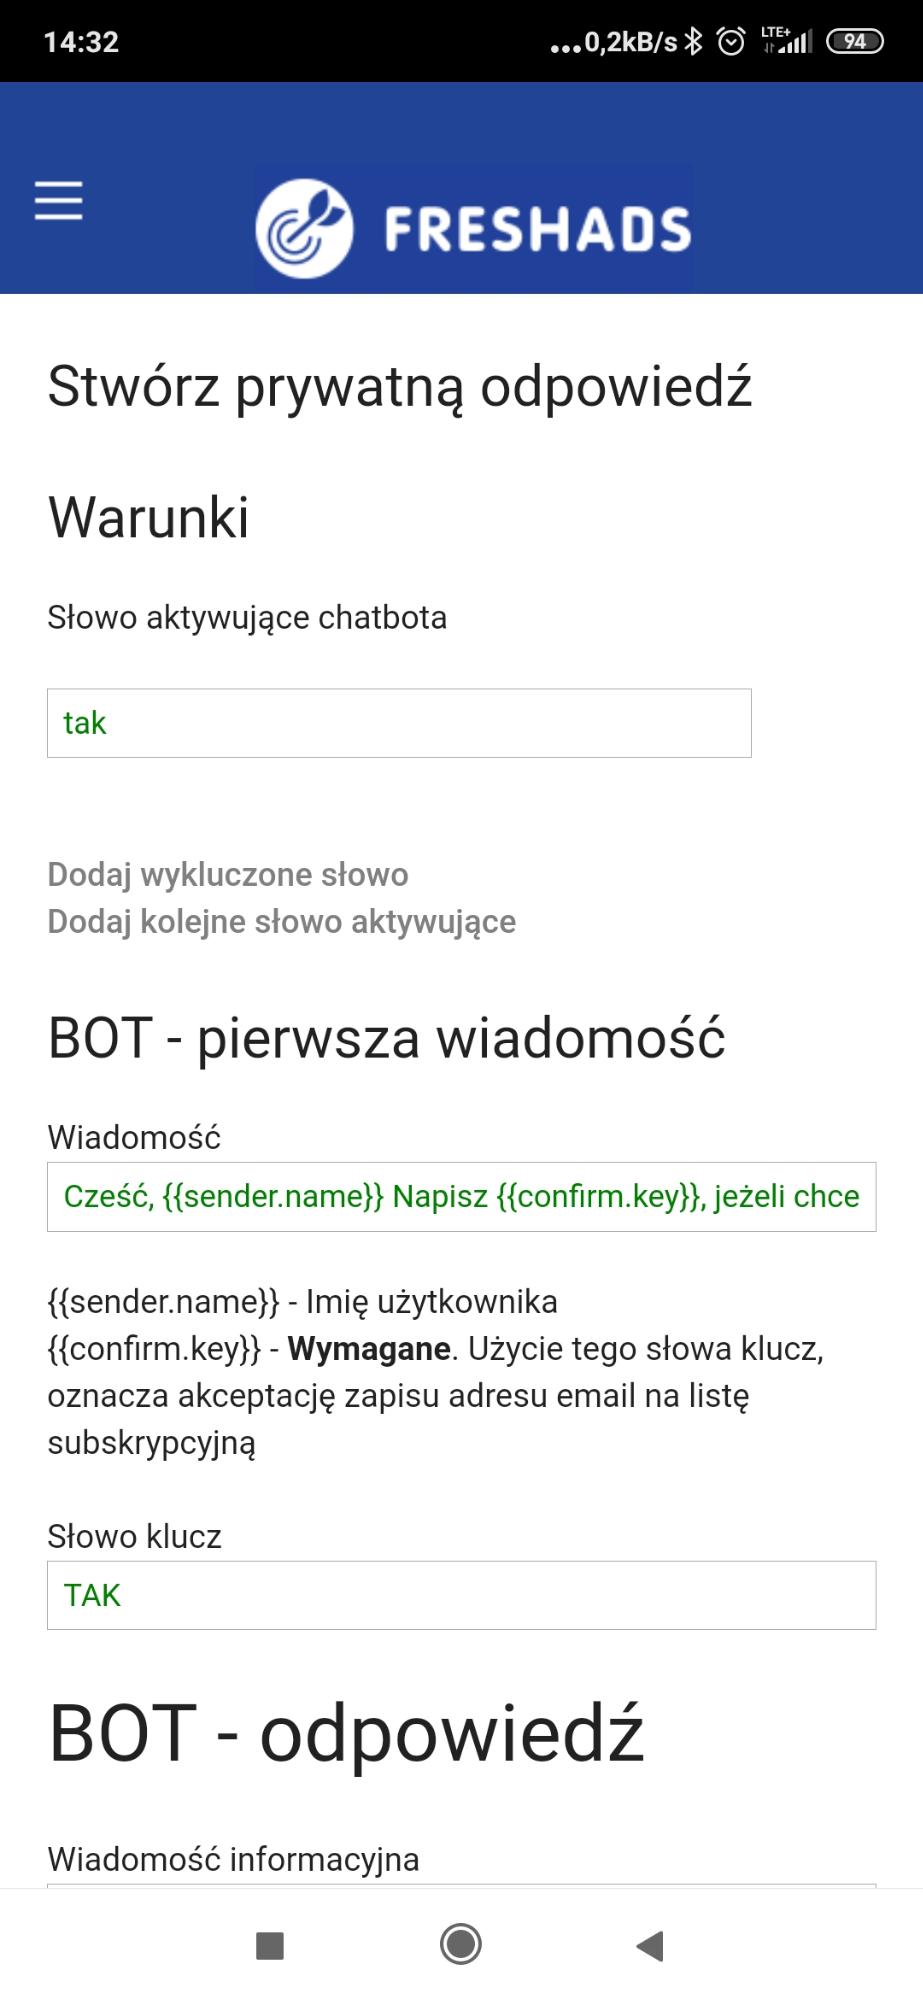 Freshads- chatbot